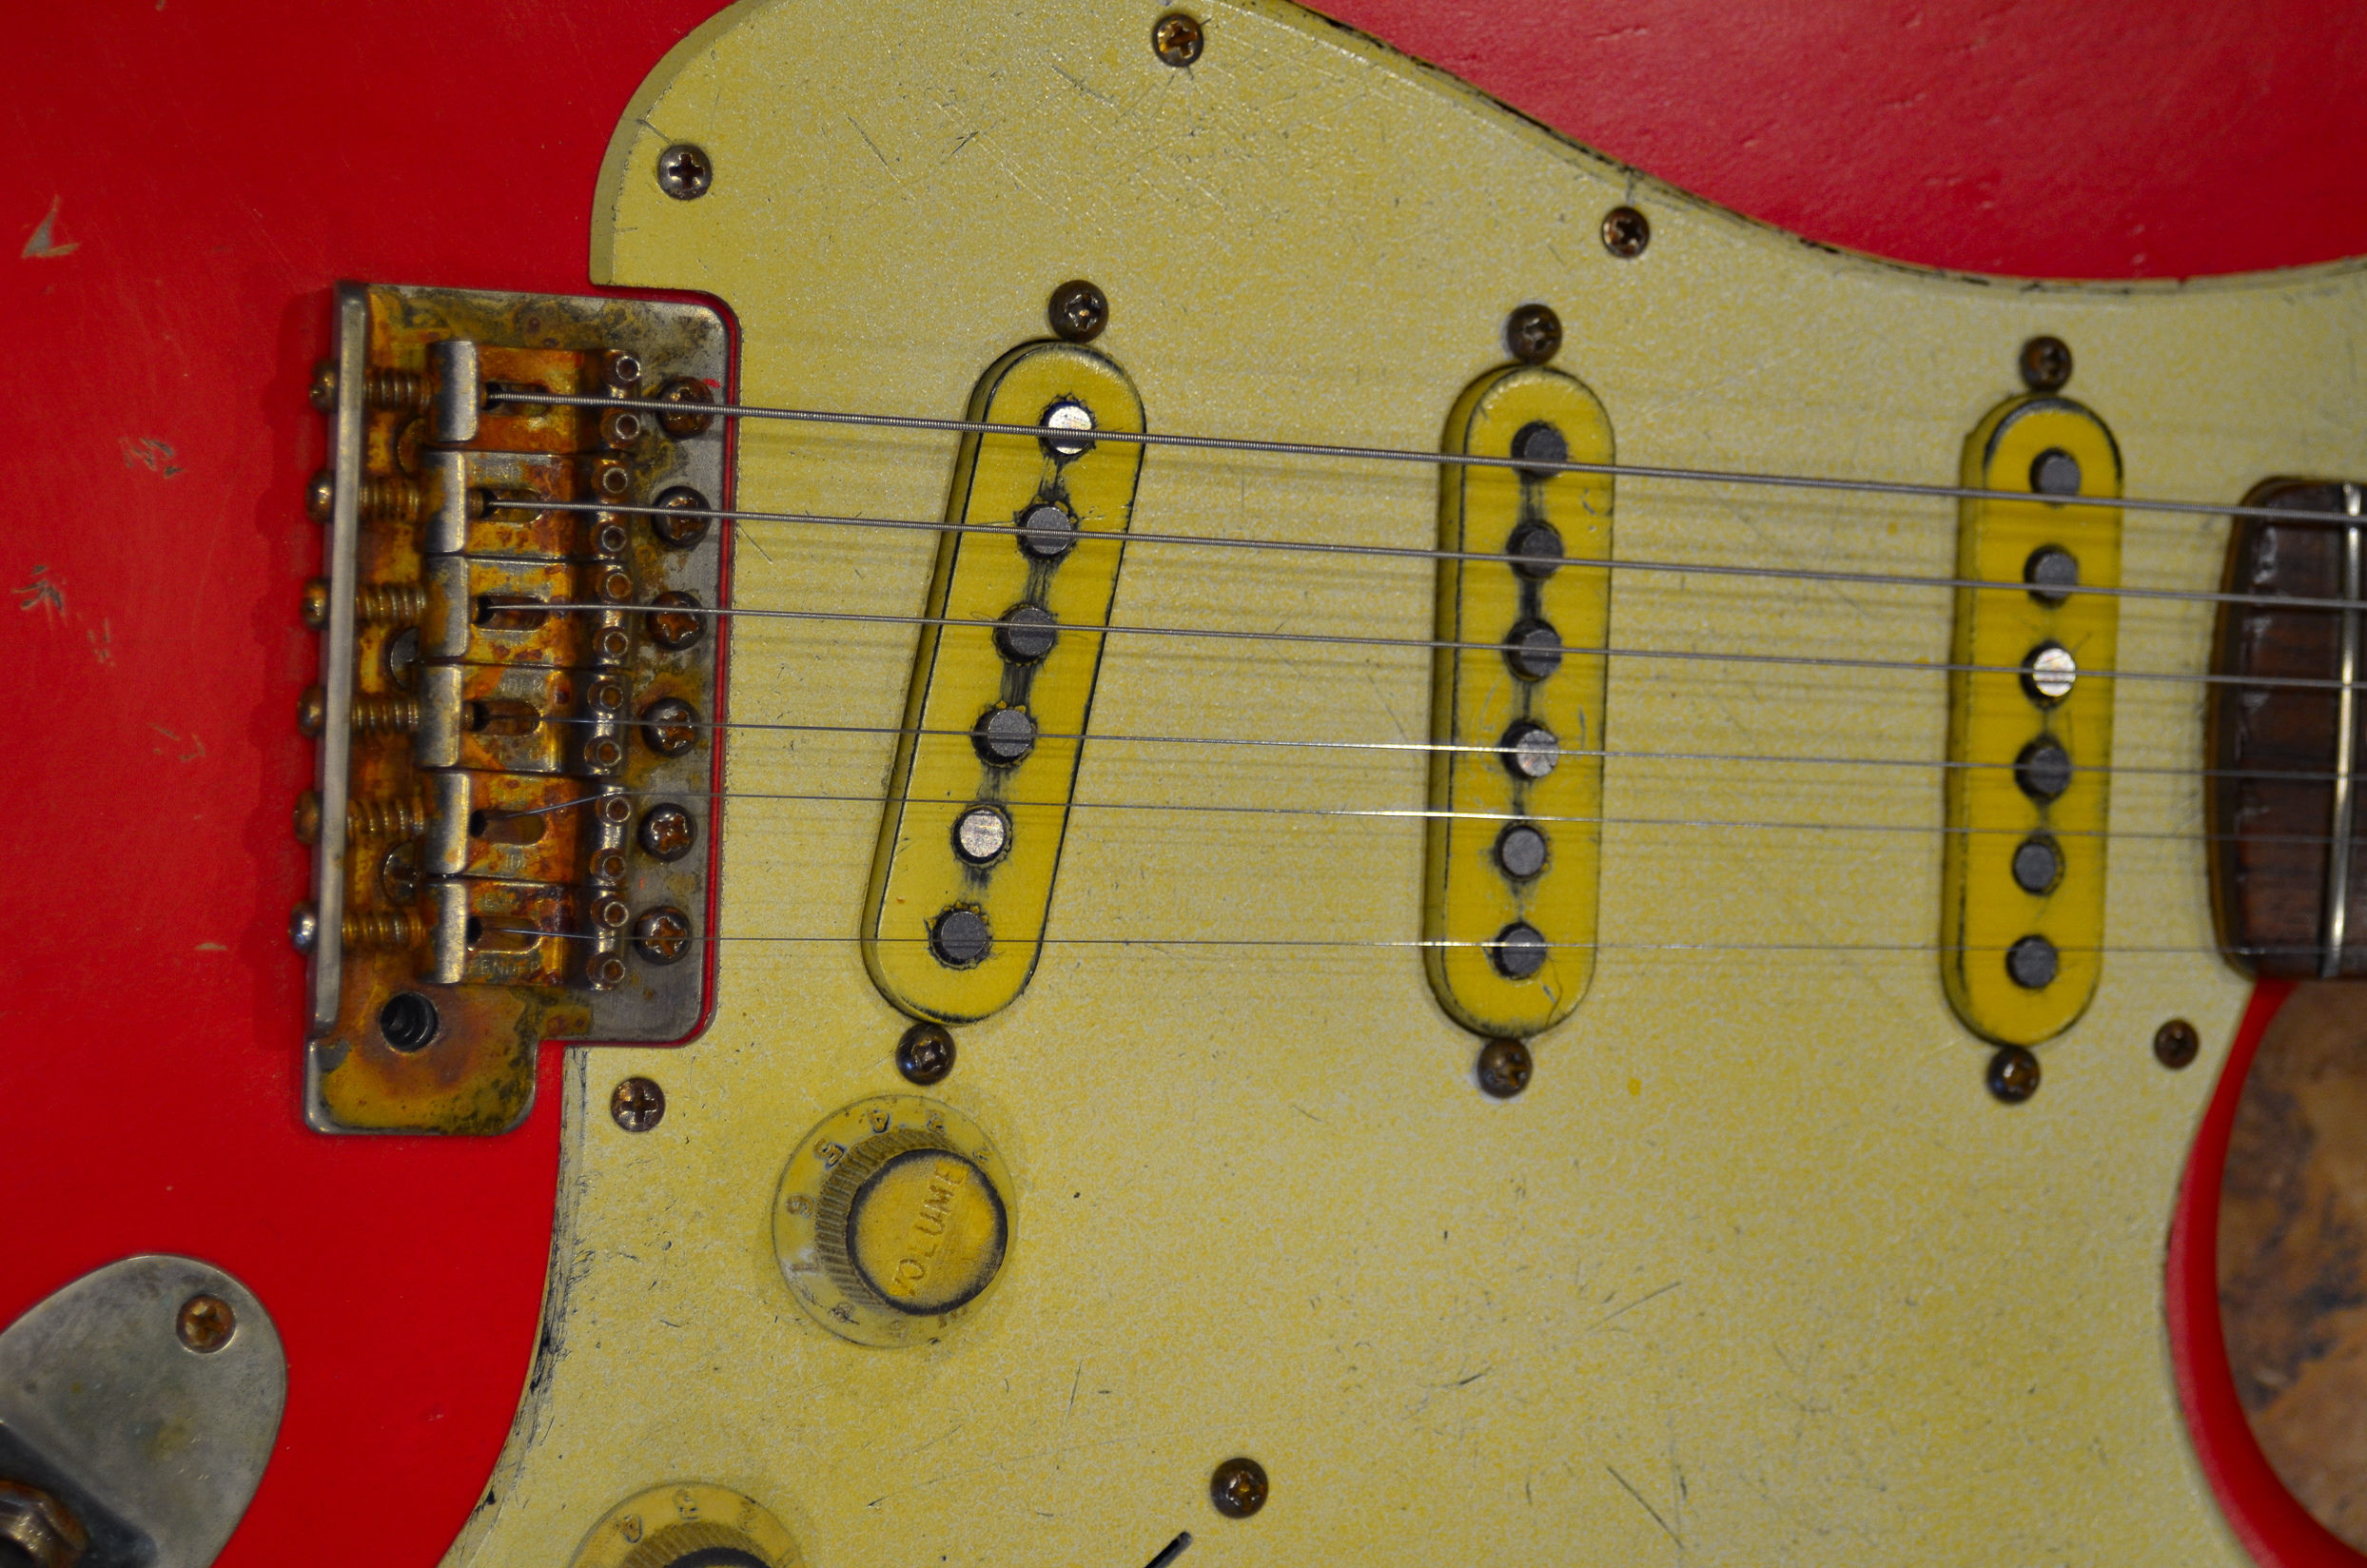 Fender Stratocaster Relic Fiesta Red Pickguard Guitarwacky.com